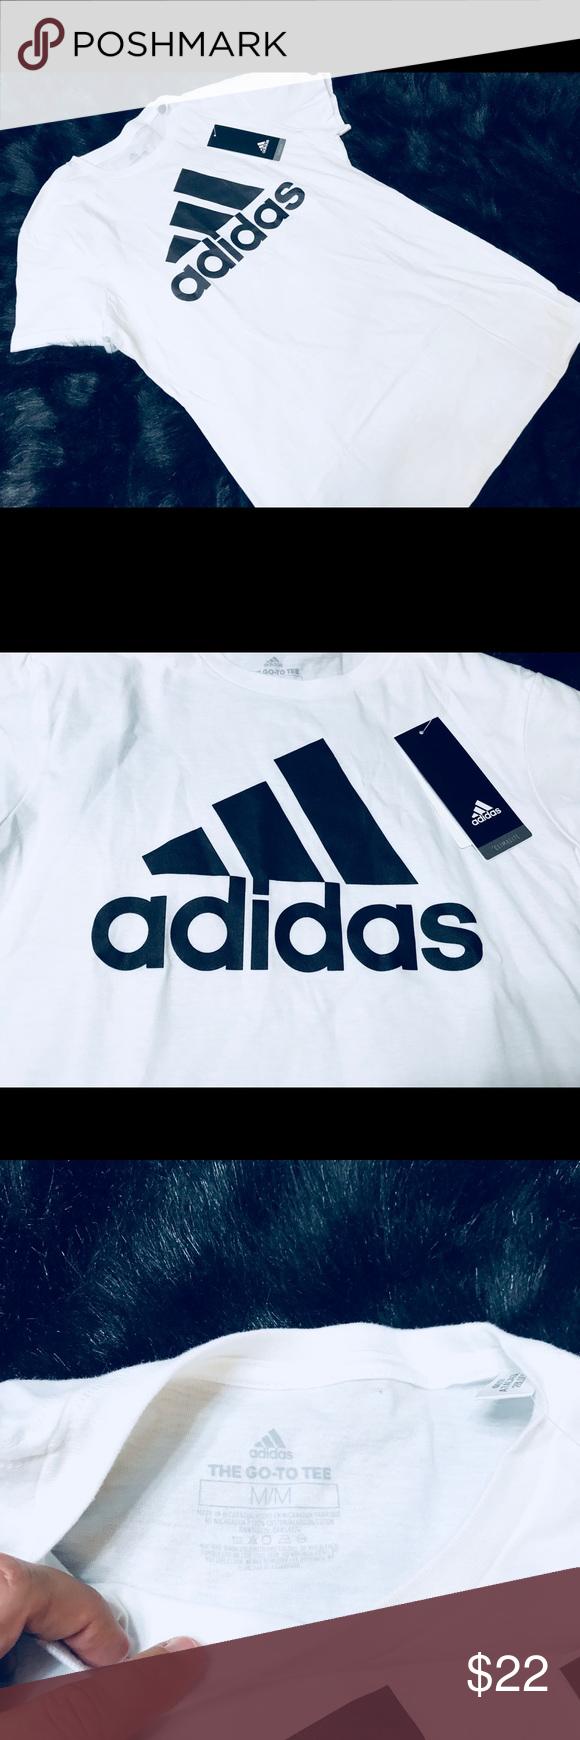 ♥️{Adidas} Women's White & Black Logo Tee♥️ Adidas women